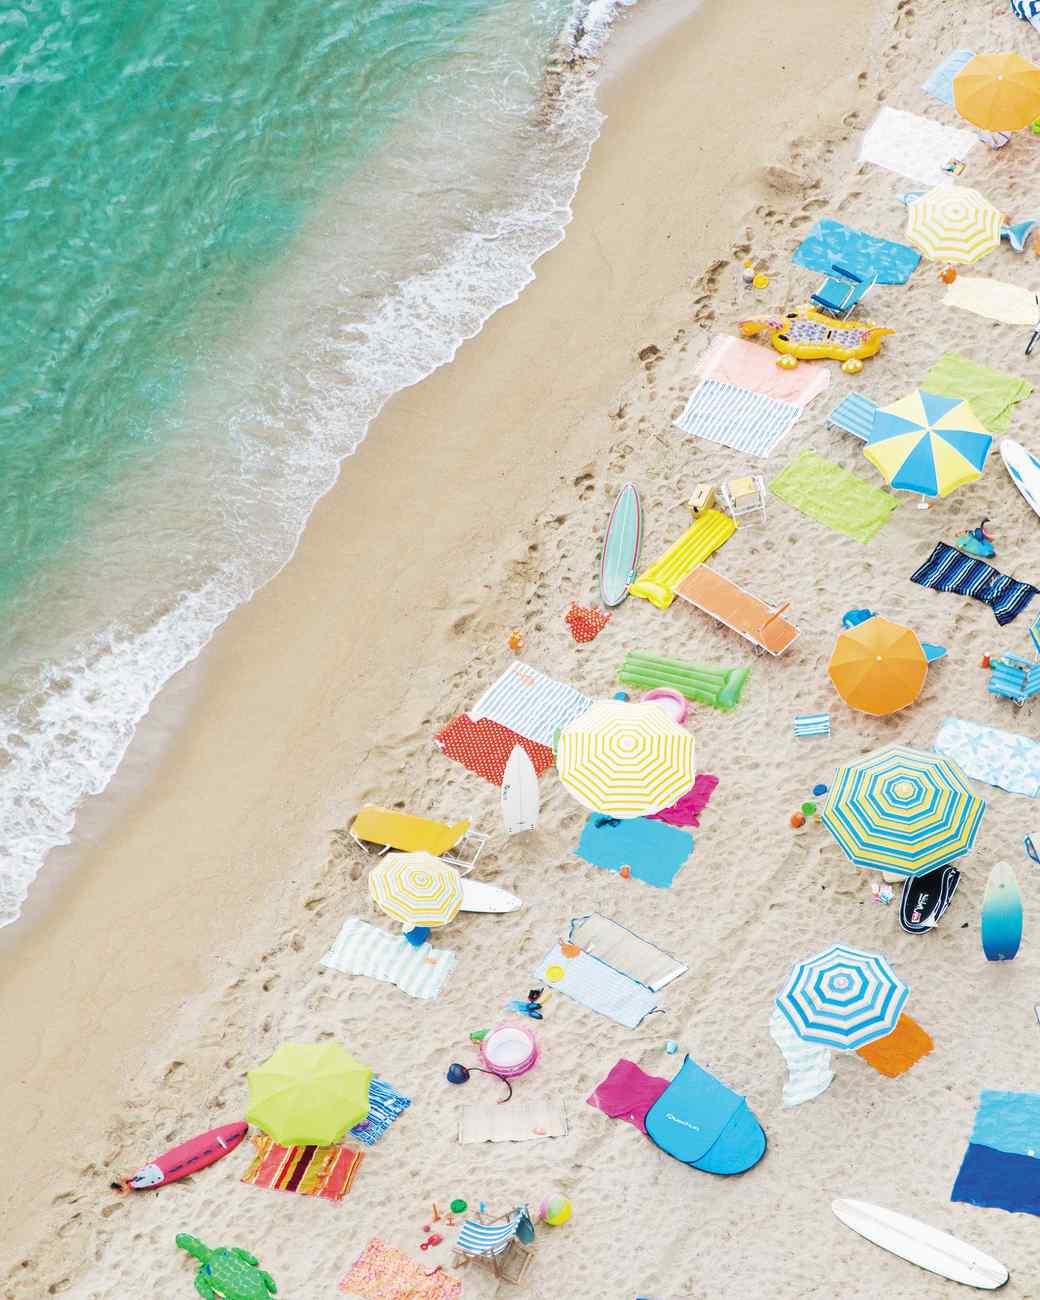 beaches_p100.jpg